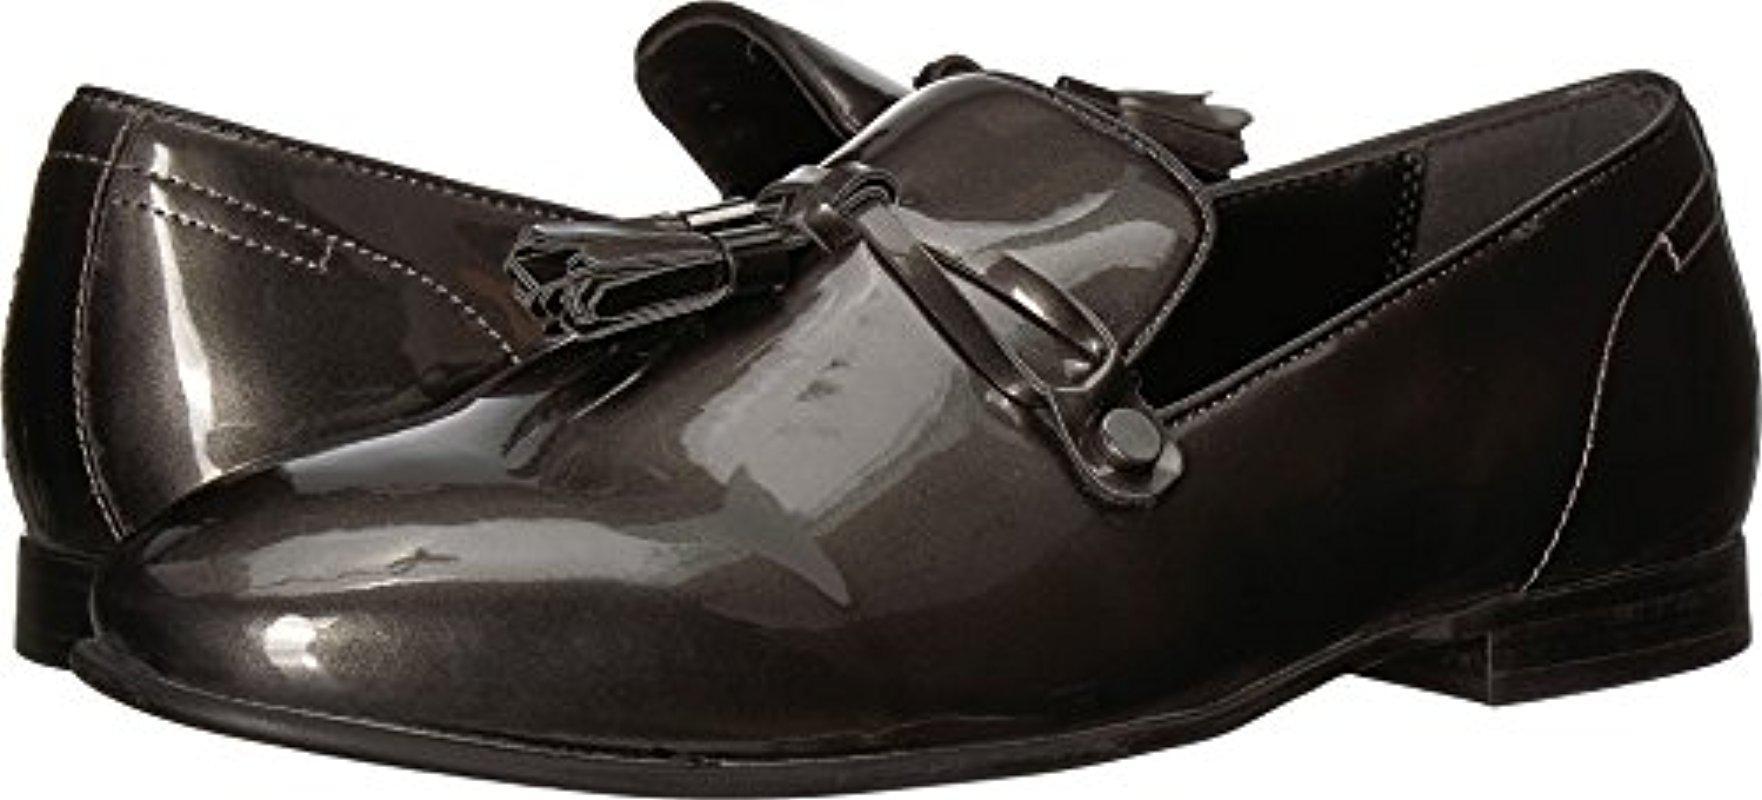 1d4ff17093a Lyst - Aldo Mccrery Loafer in Black